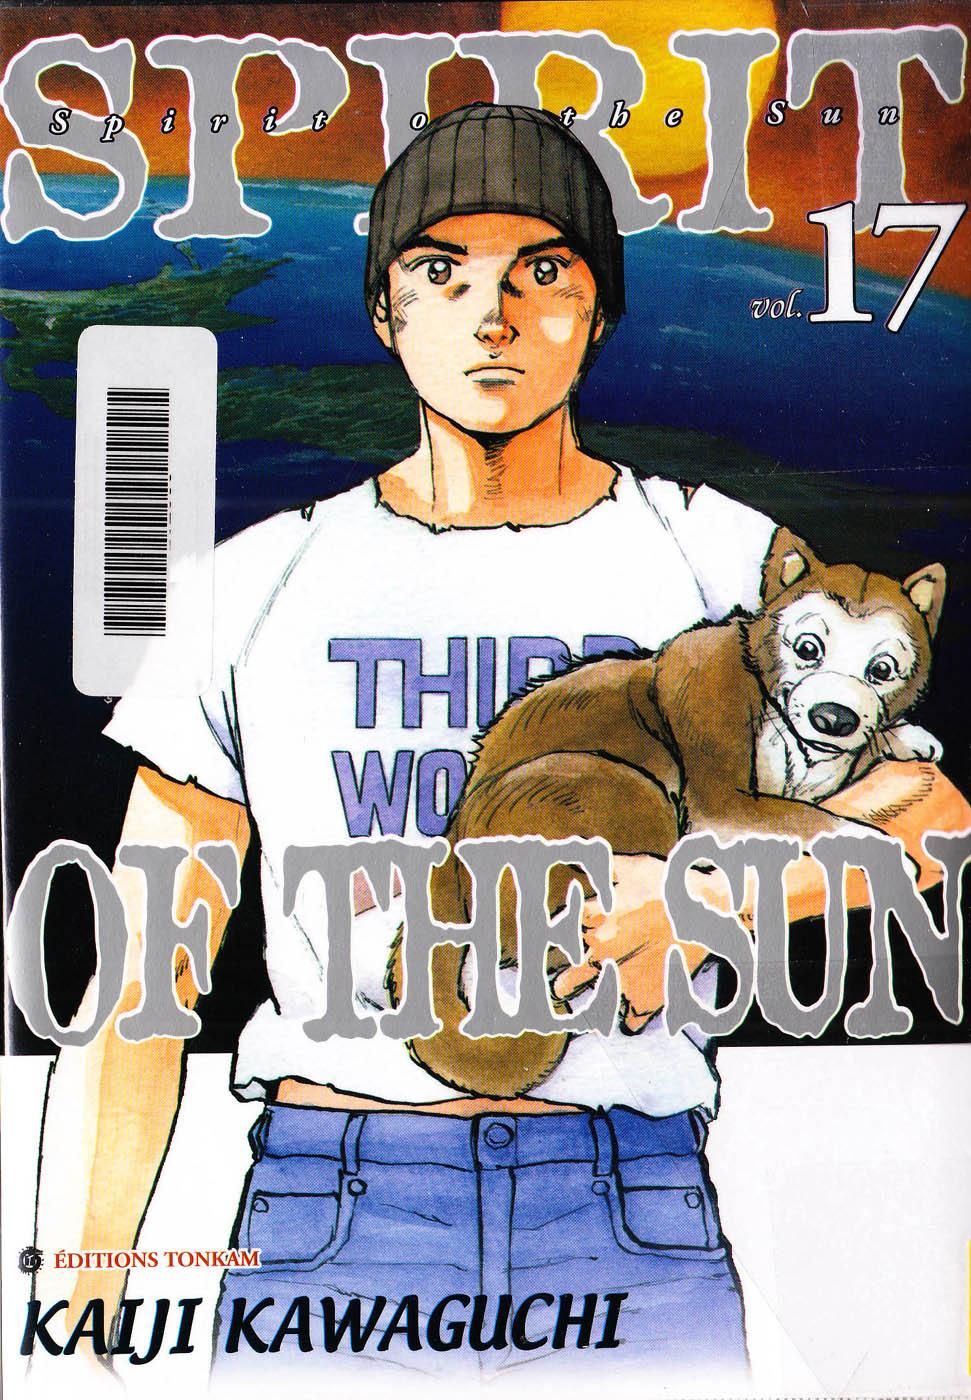 https://nine.mangadogs.com/fr_manga/pic1/31/2207/76895/SpiritOfTheSunVolume17VF_0_40.jpg Page 1